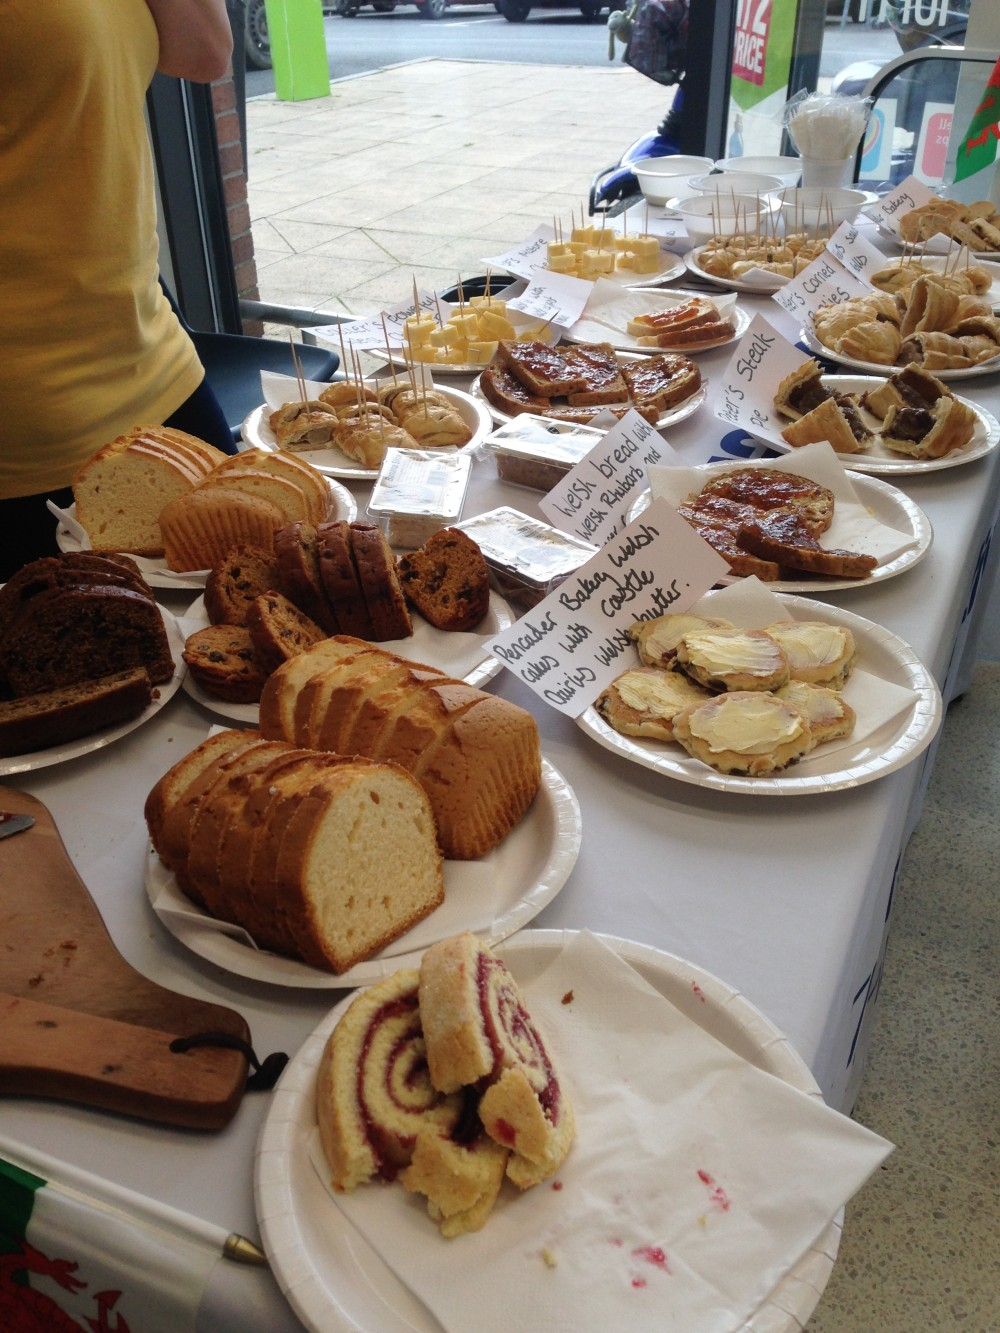 Co-op Community Champion arranges Welsh tasting day